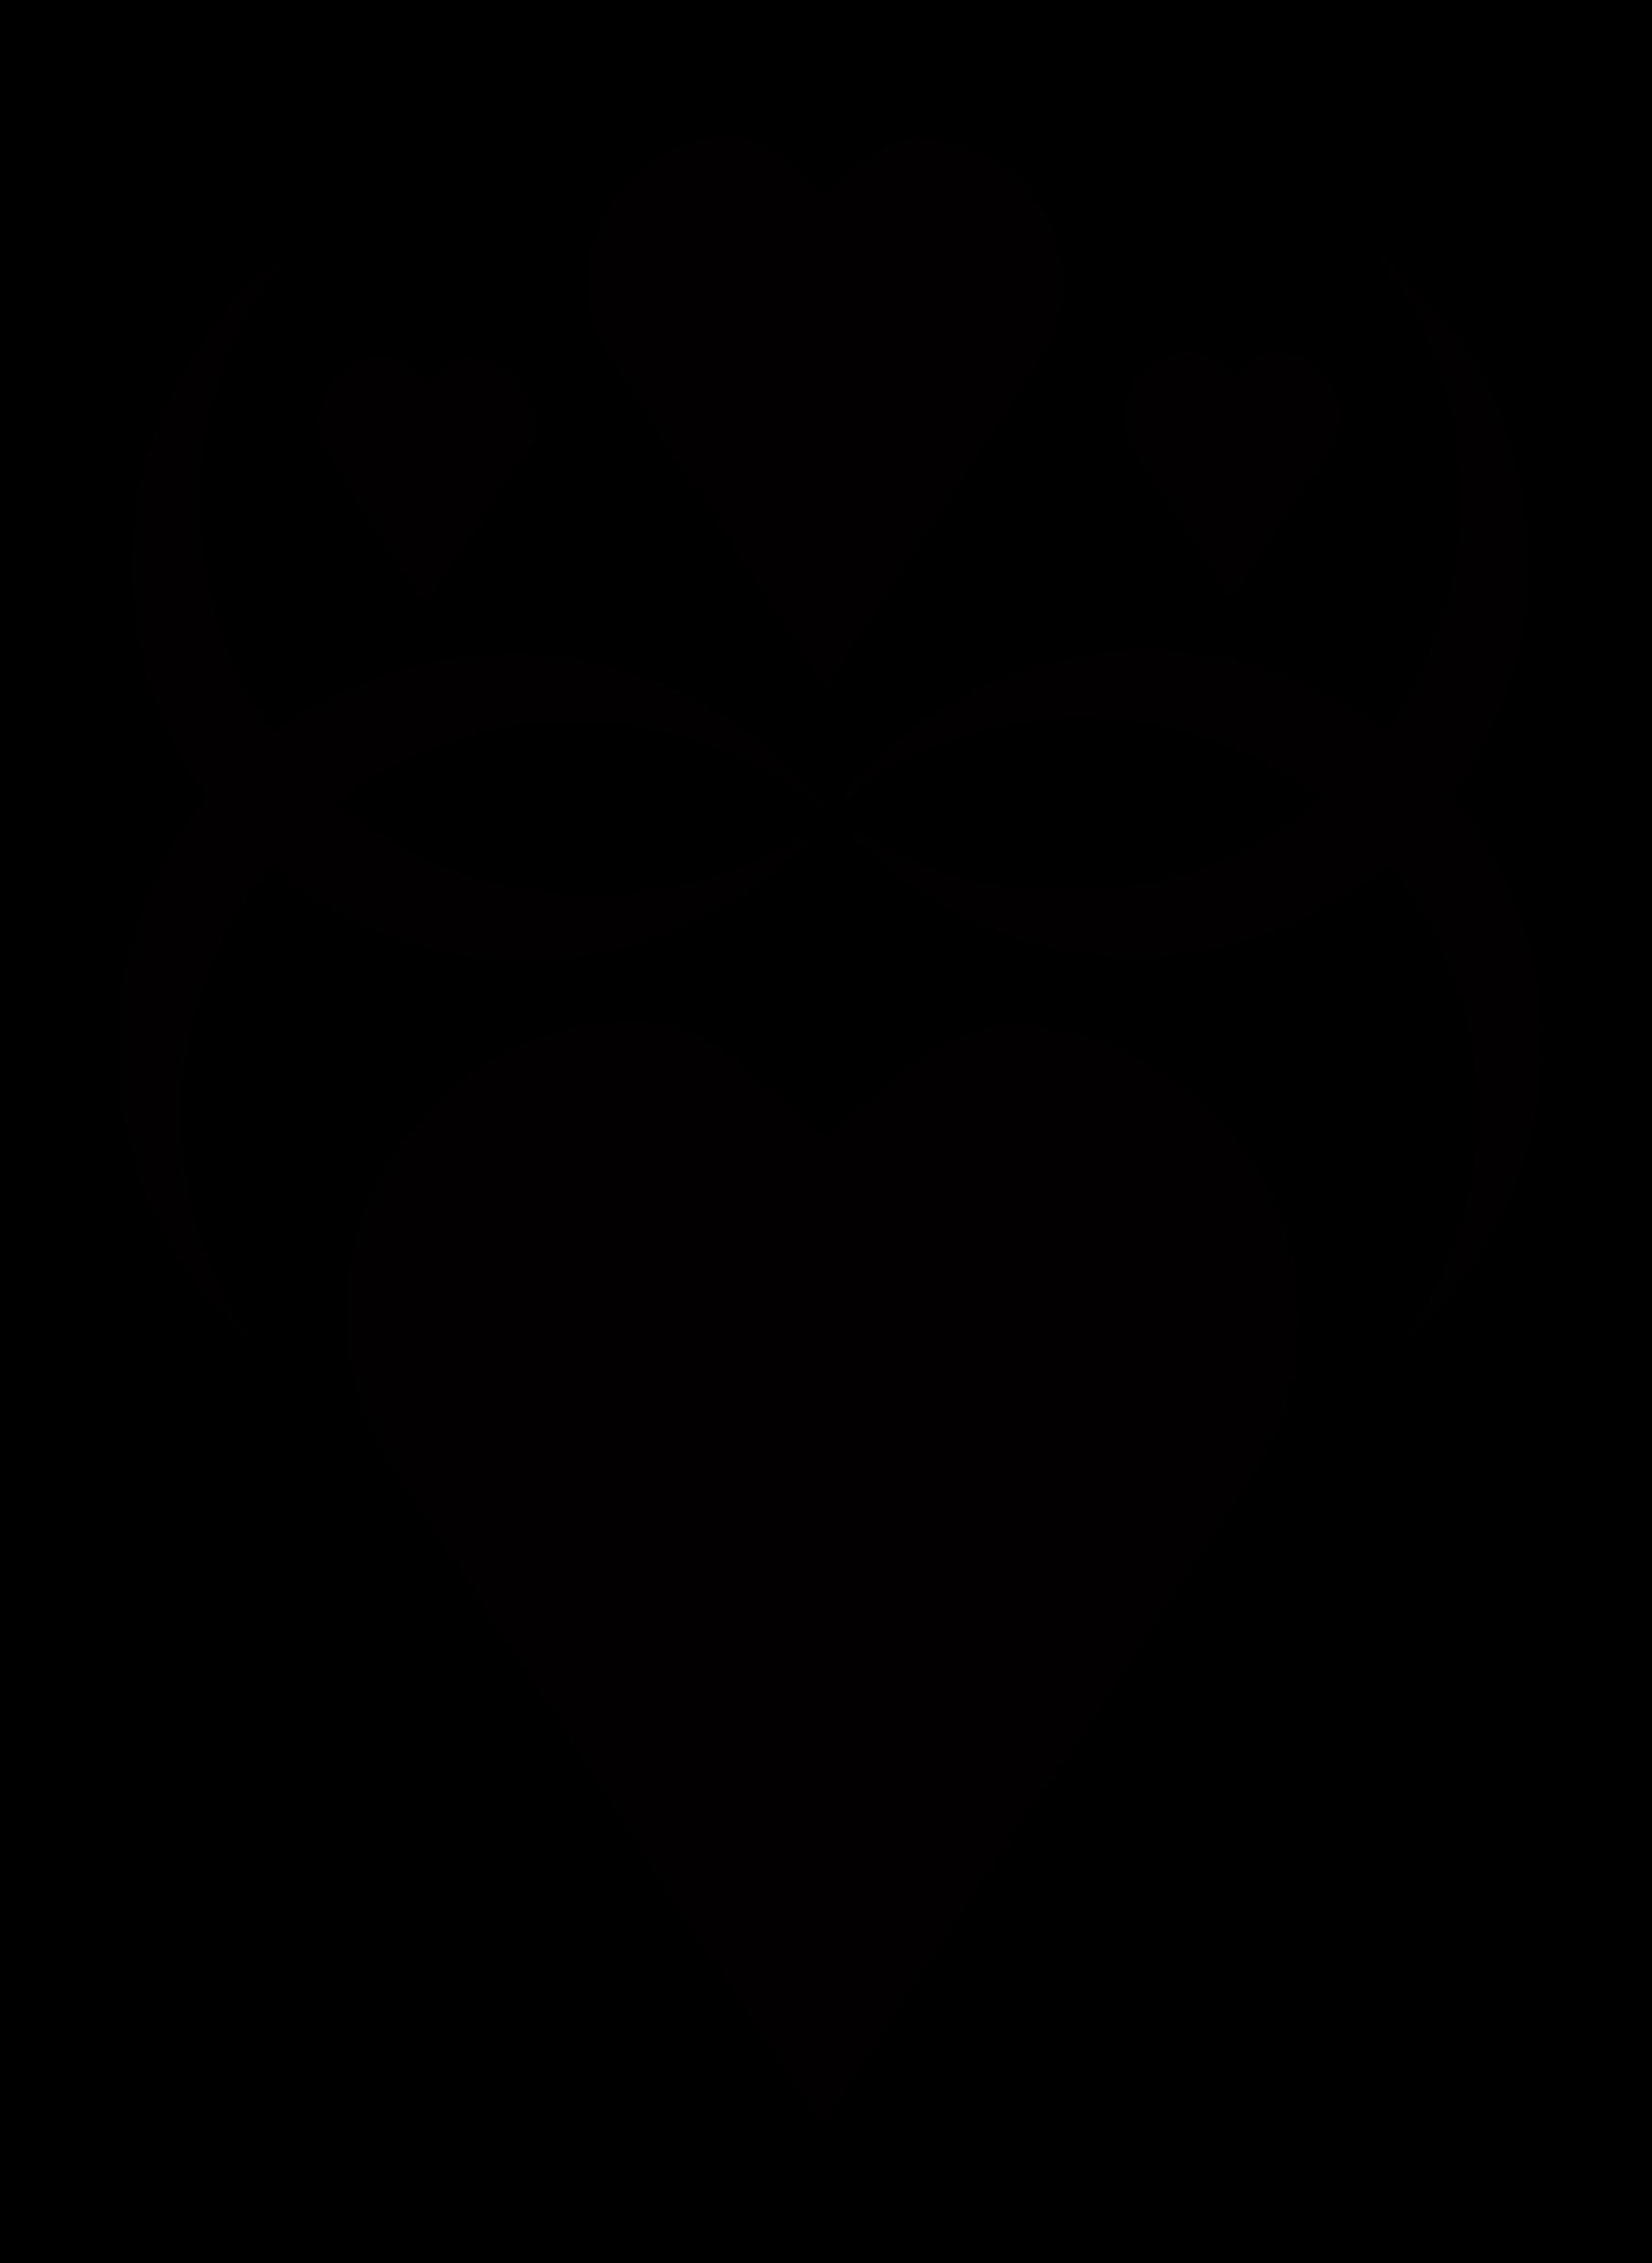 Clipart heart symbol heart symbol buycottarizona Images